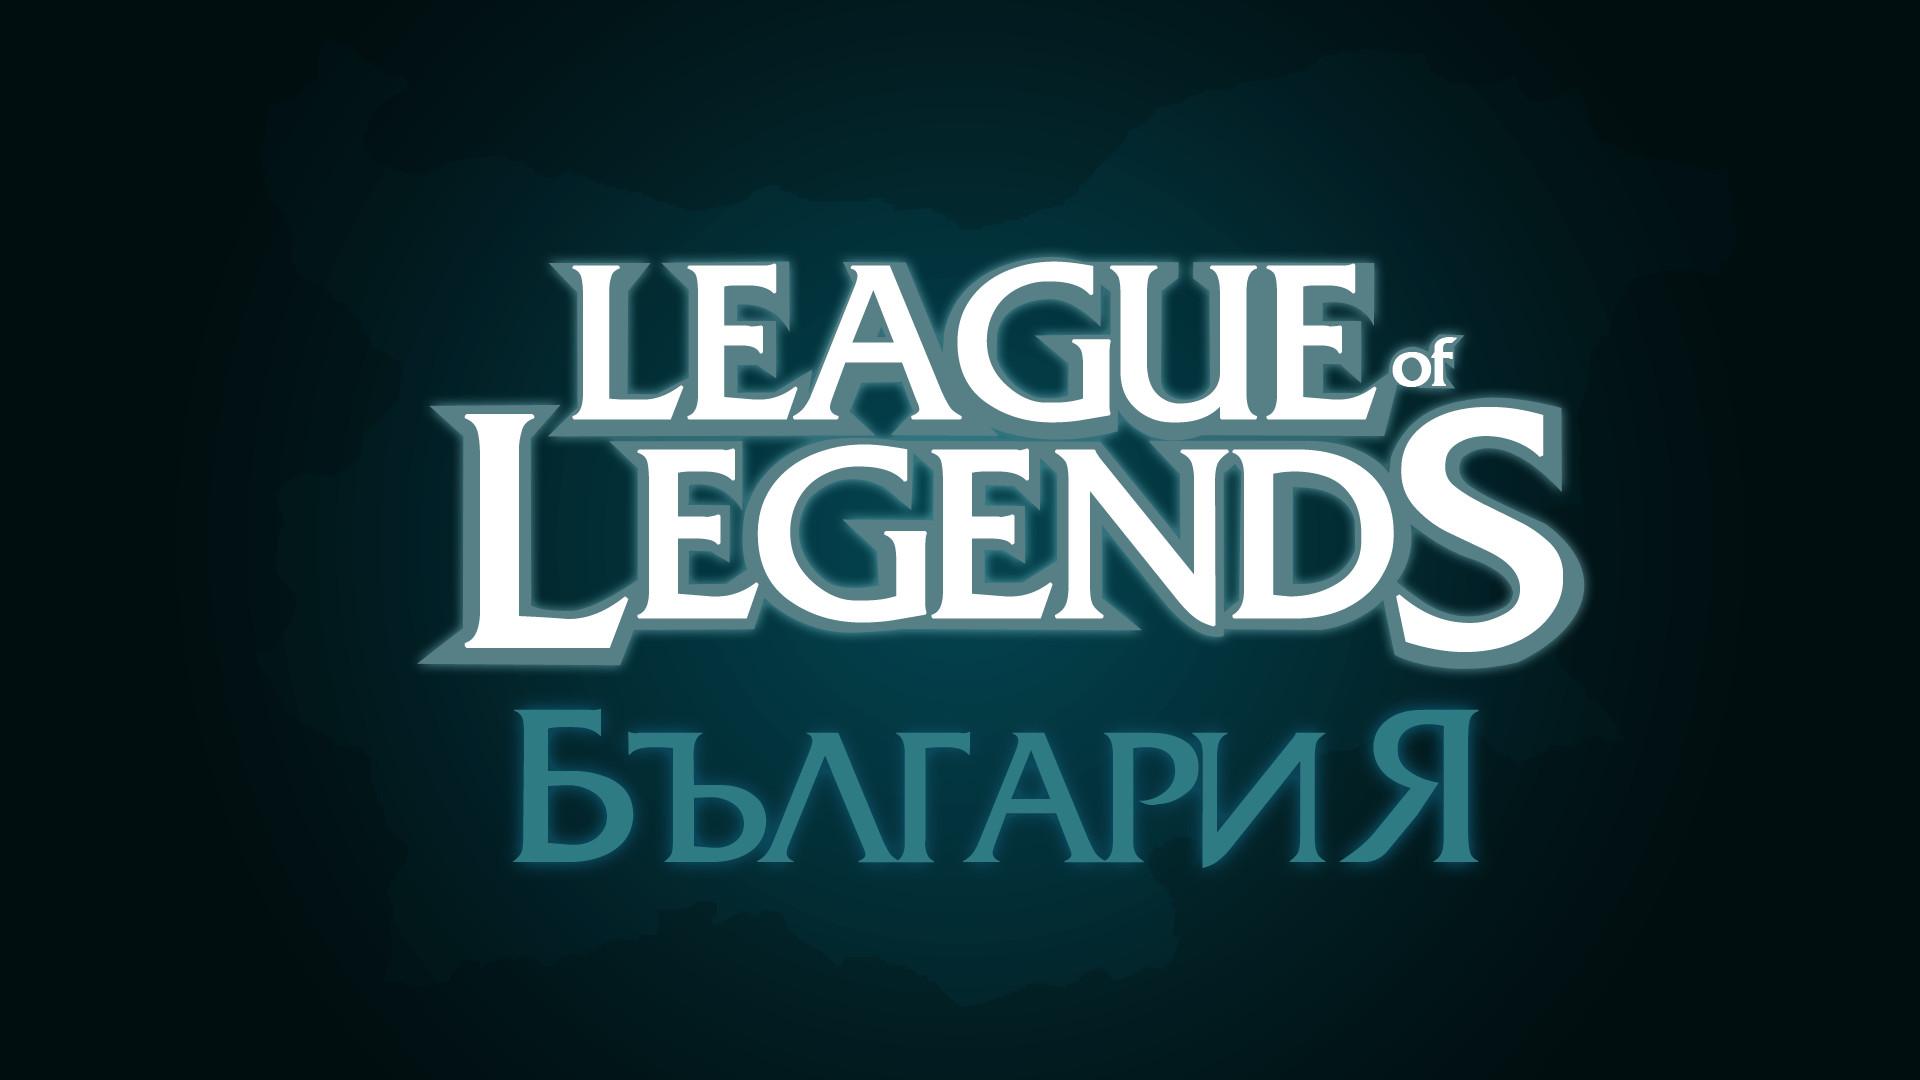 League of Legends League Of Legends Logo Wallpaper